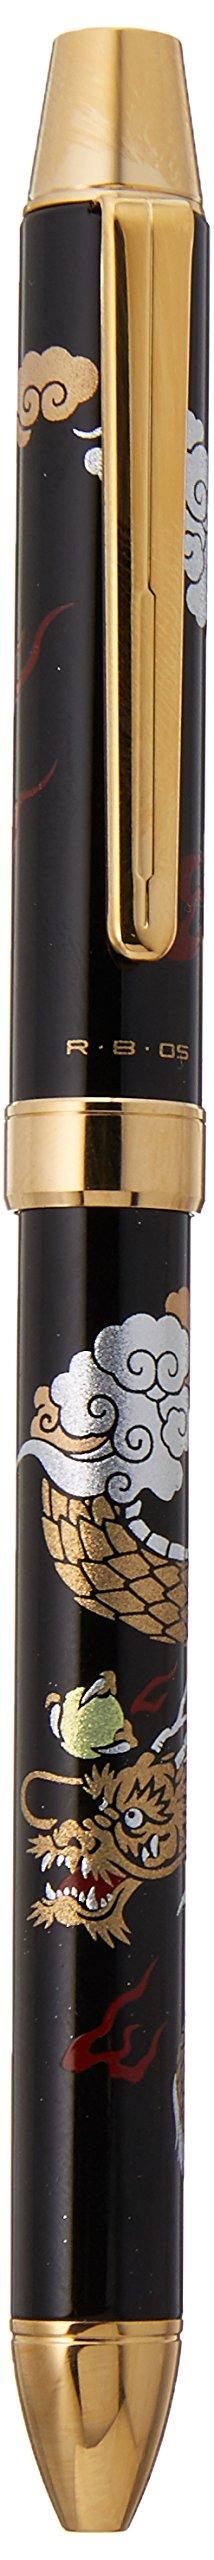 Pilot Mechanical Pencil, 0.5mm + Ballpoint Pen, 0.7mm, Fine, Black and Red, 2+1 Miyabi Emaki, Dragon (BTHM-5SR-R) by Pilot (Image #1)